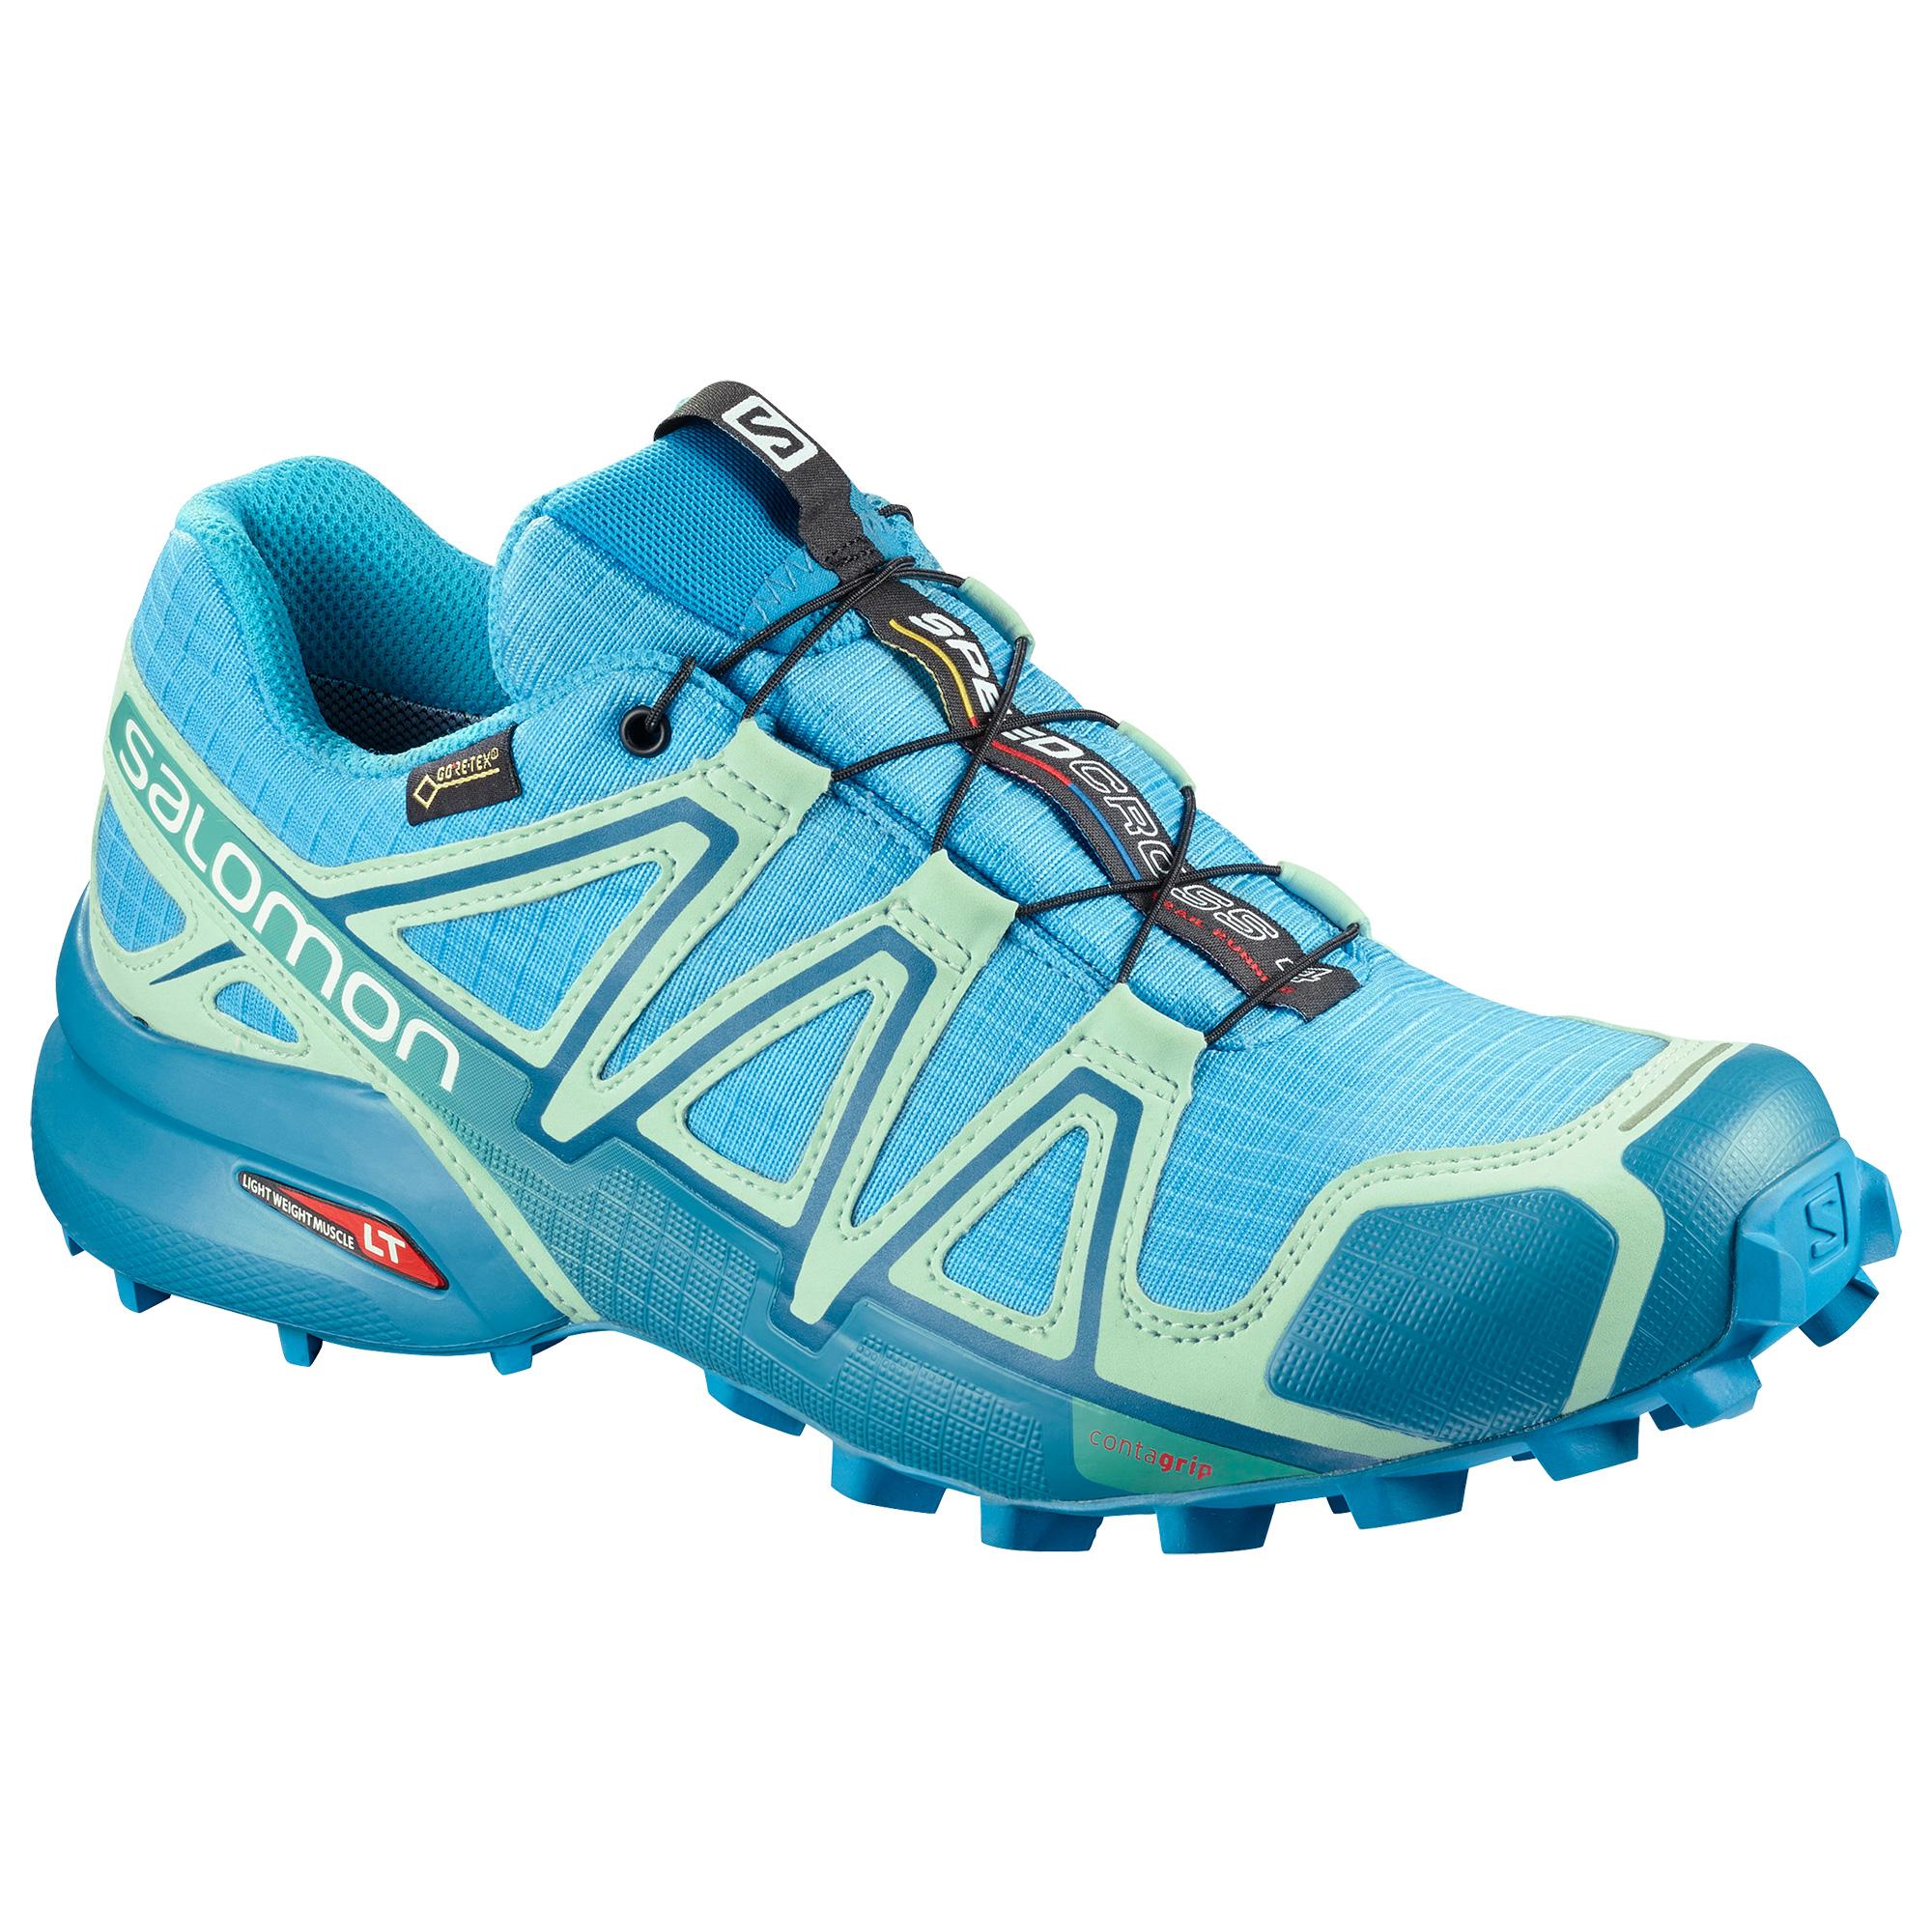 Salomon Shoes Speedcross 4 GTX Hiking Boots Women's